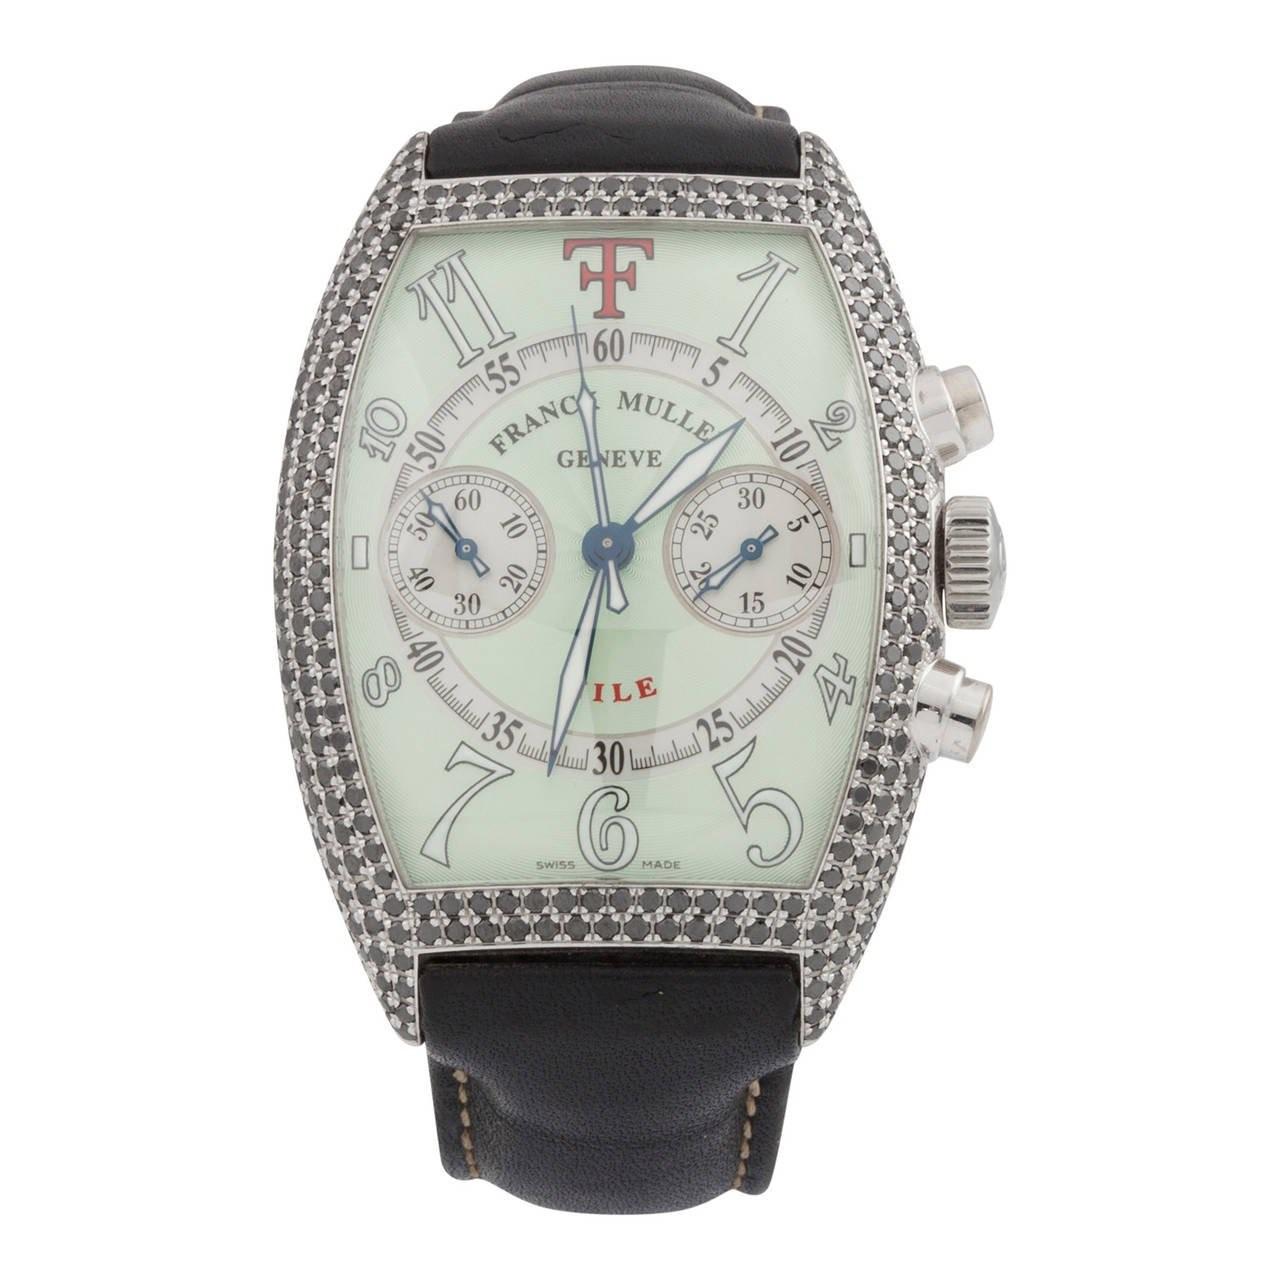 Franc Muller Uhr verkaufen